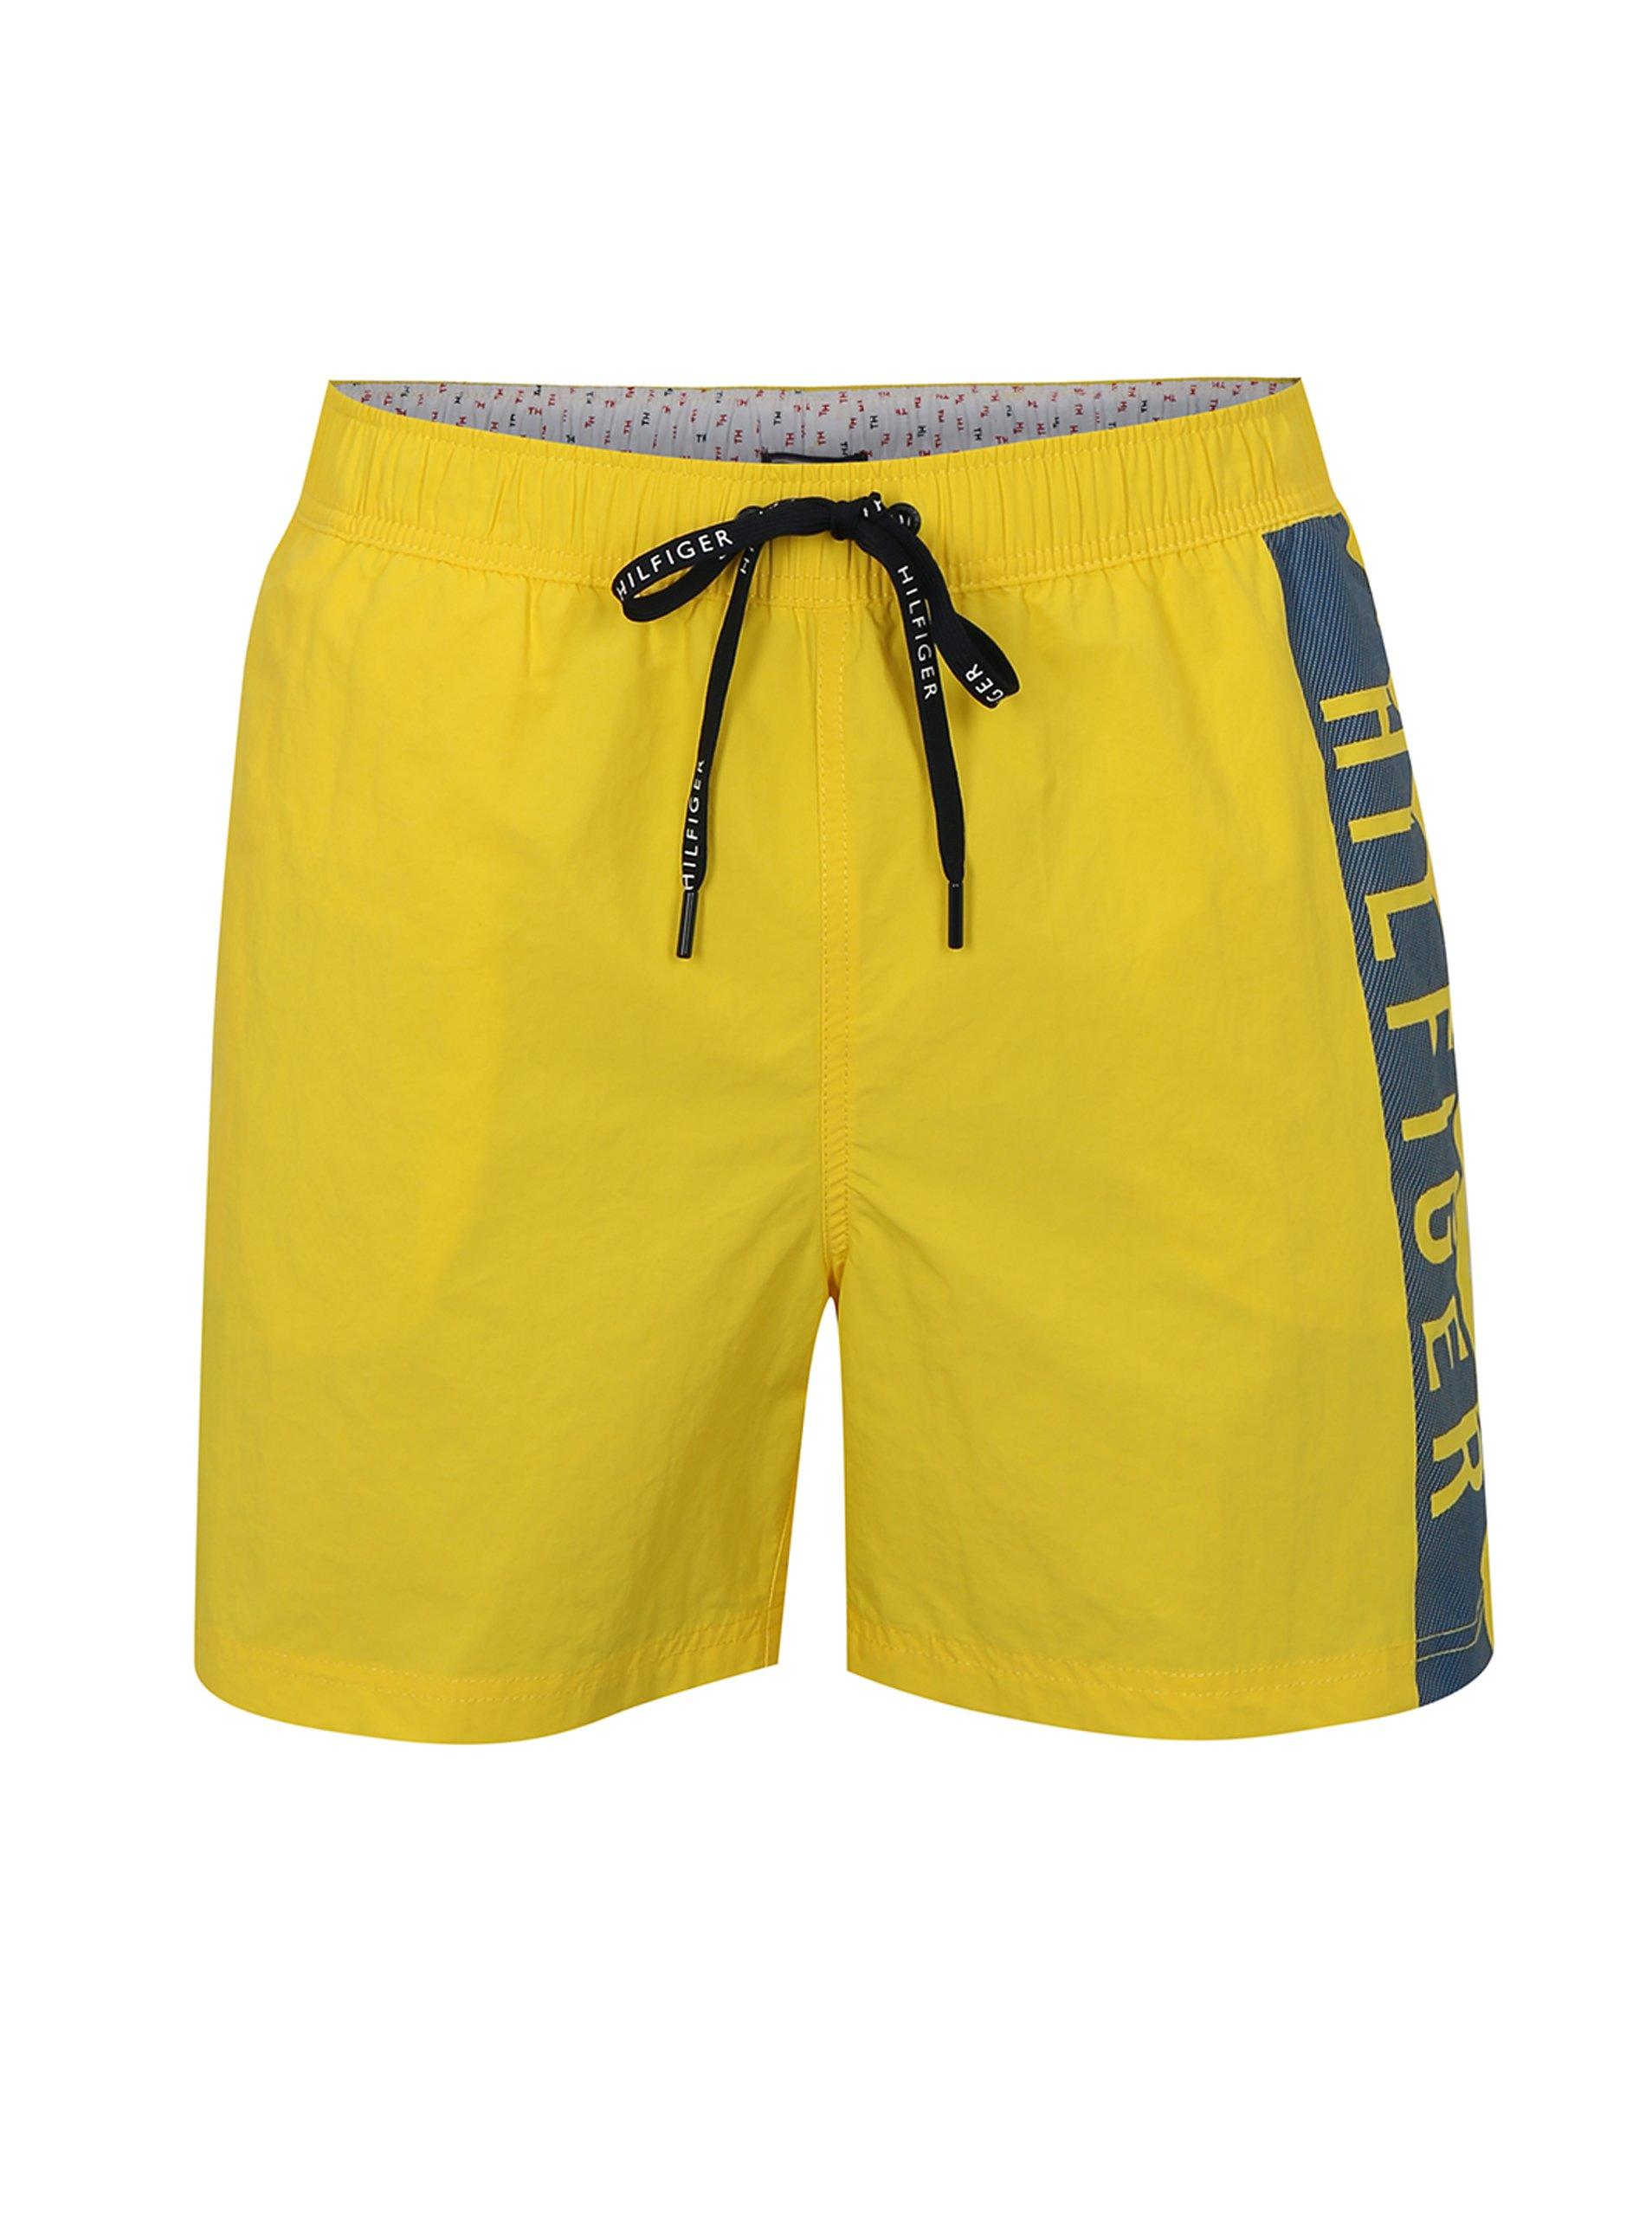 Žlté pánske plavky Tommy Hilfiger  1b9385a83b2